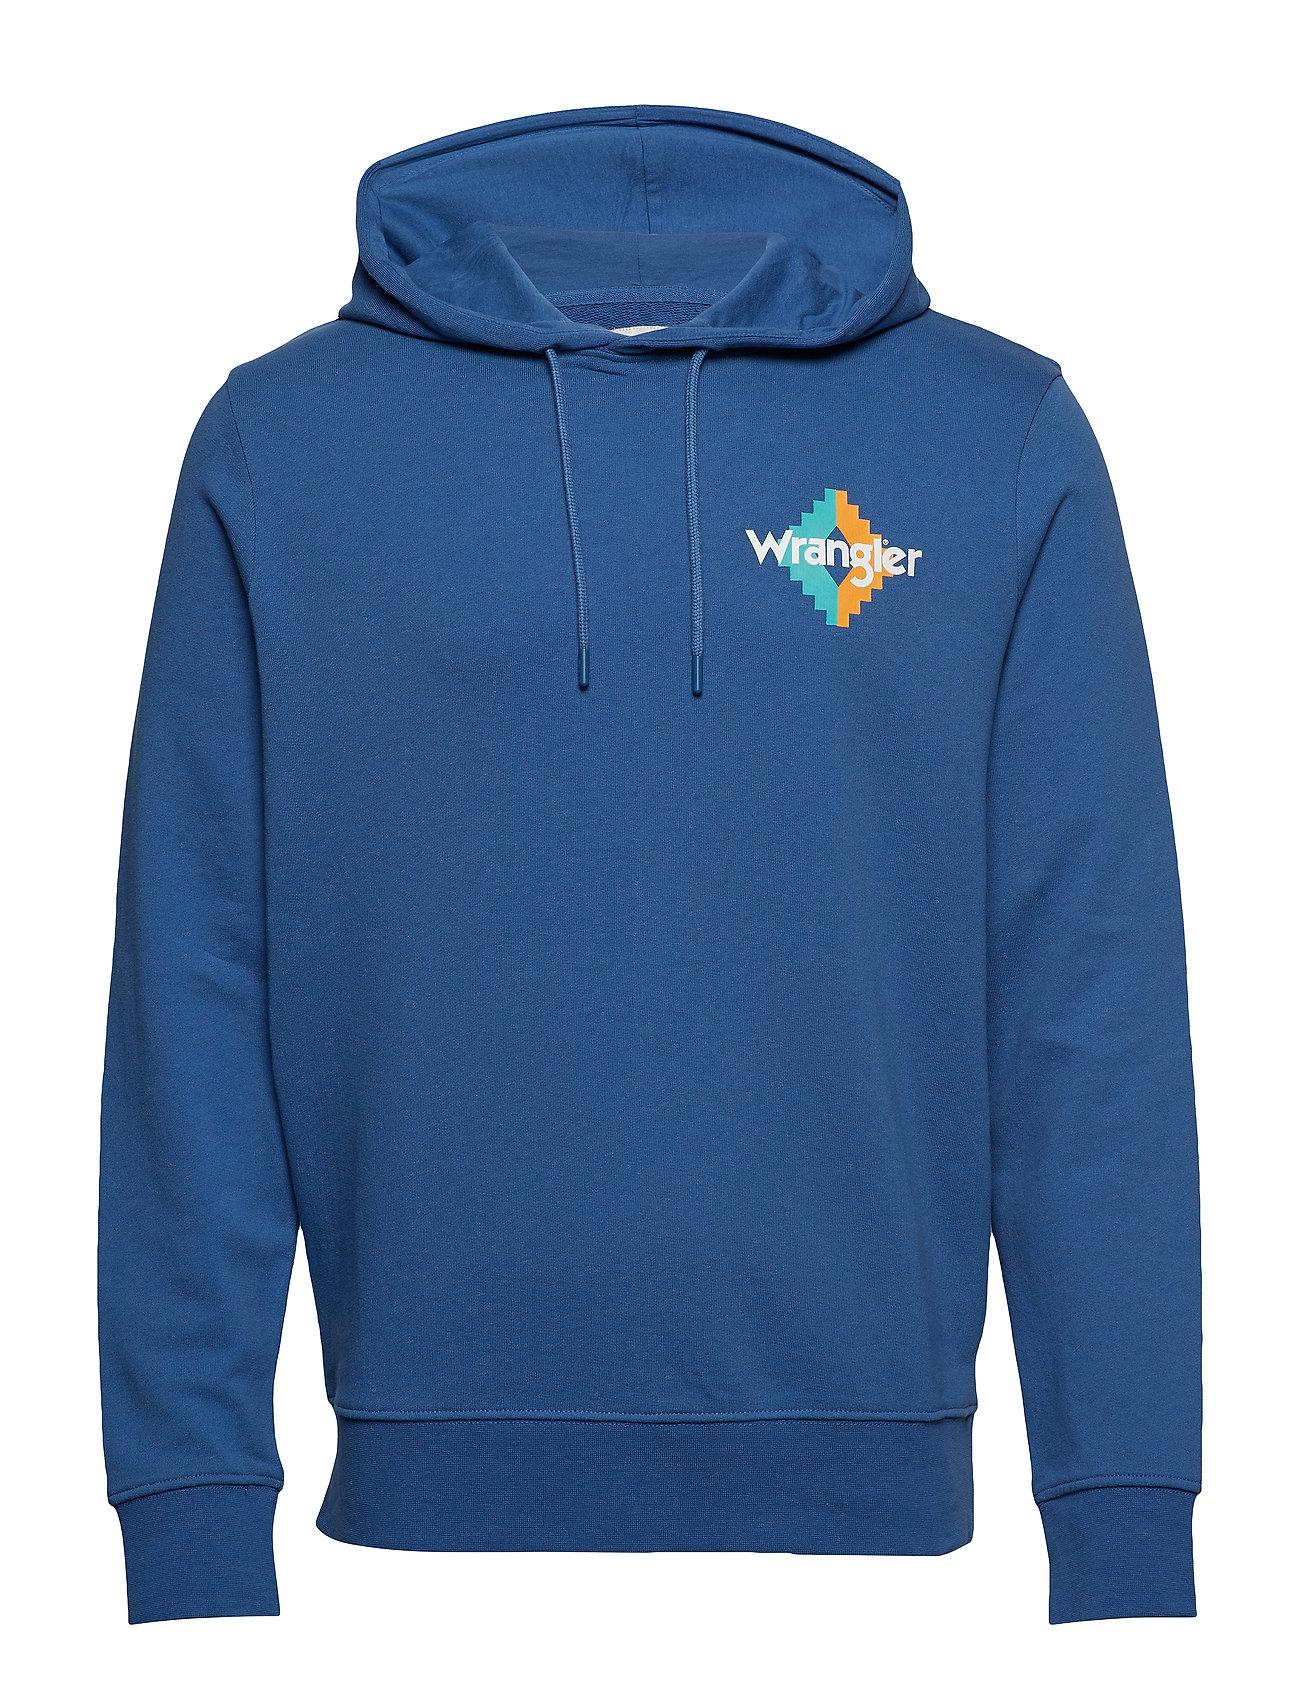 Wrangler WNC HOODIE - FEDERAL BLUE